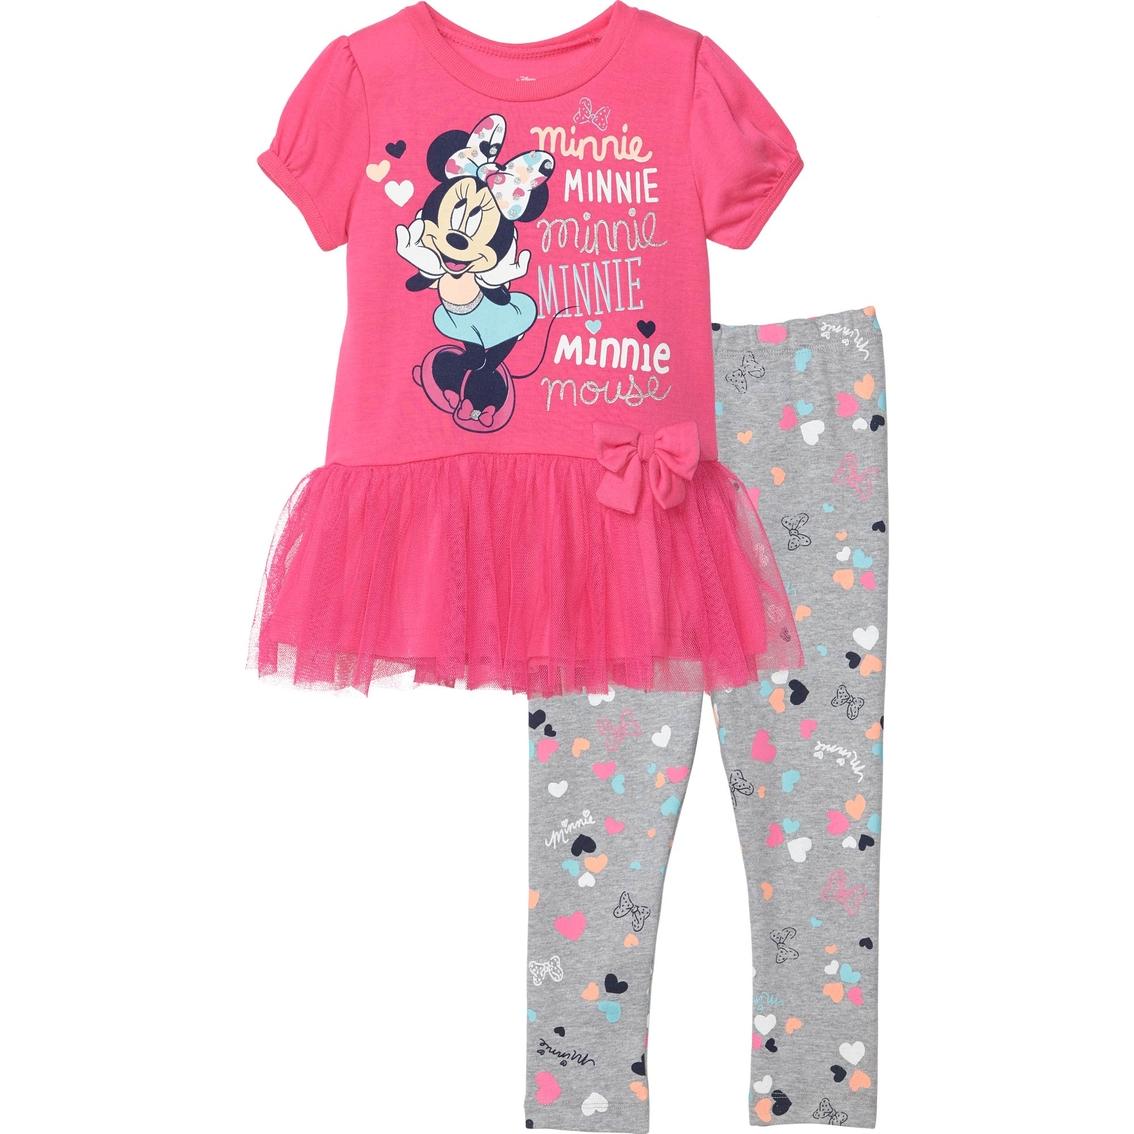 d13cfd67e5d60 Disney Toddler Girls Tulle Leggings Set, Minnie | Toddler Girls 2t ...